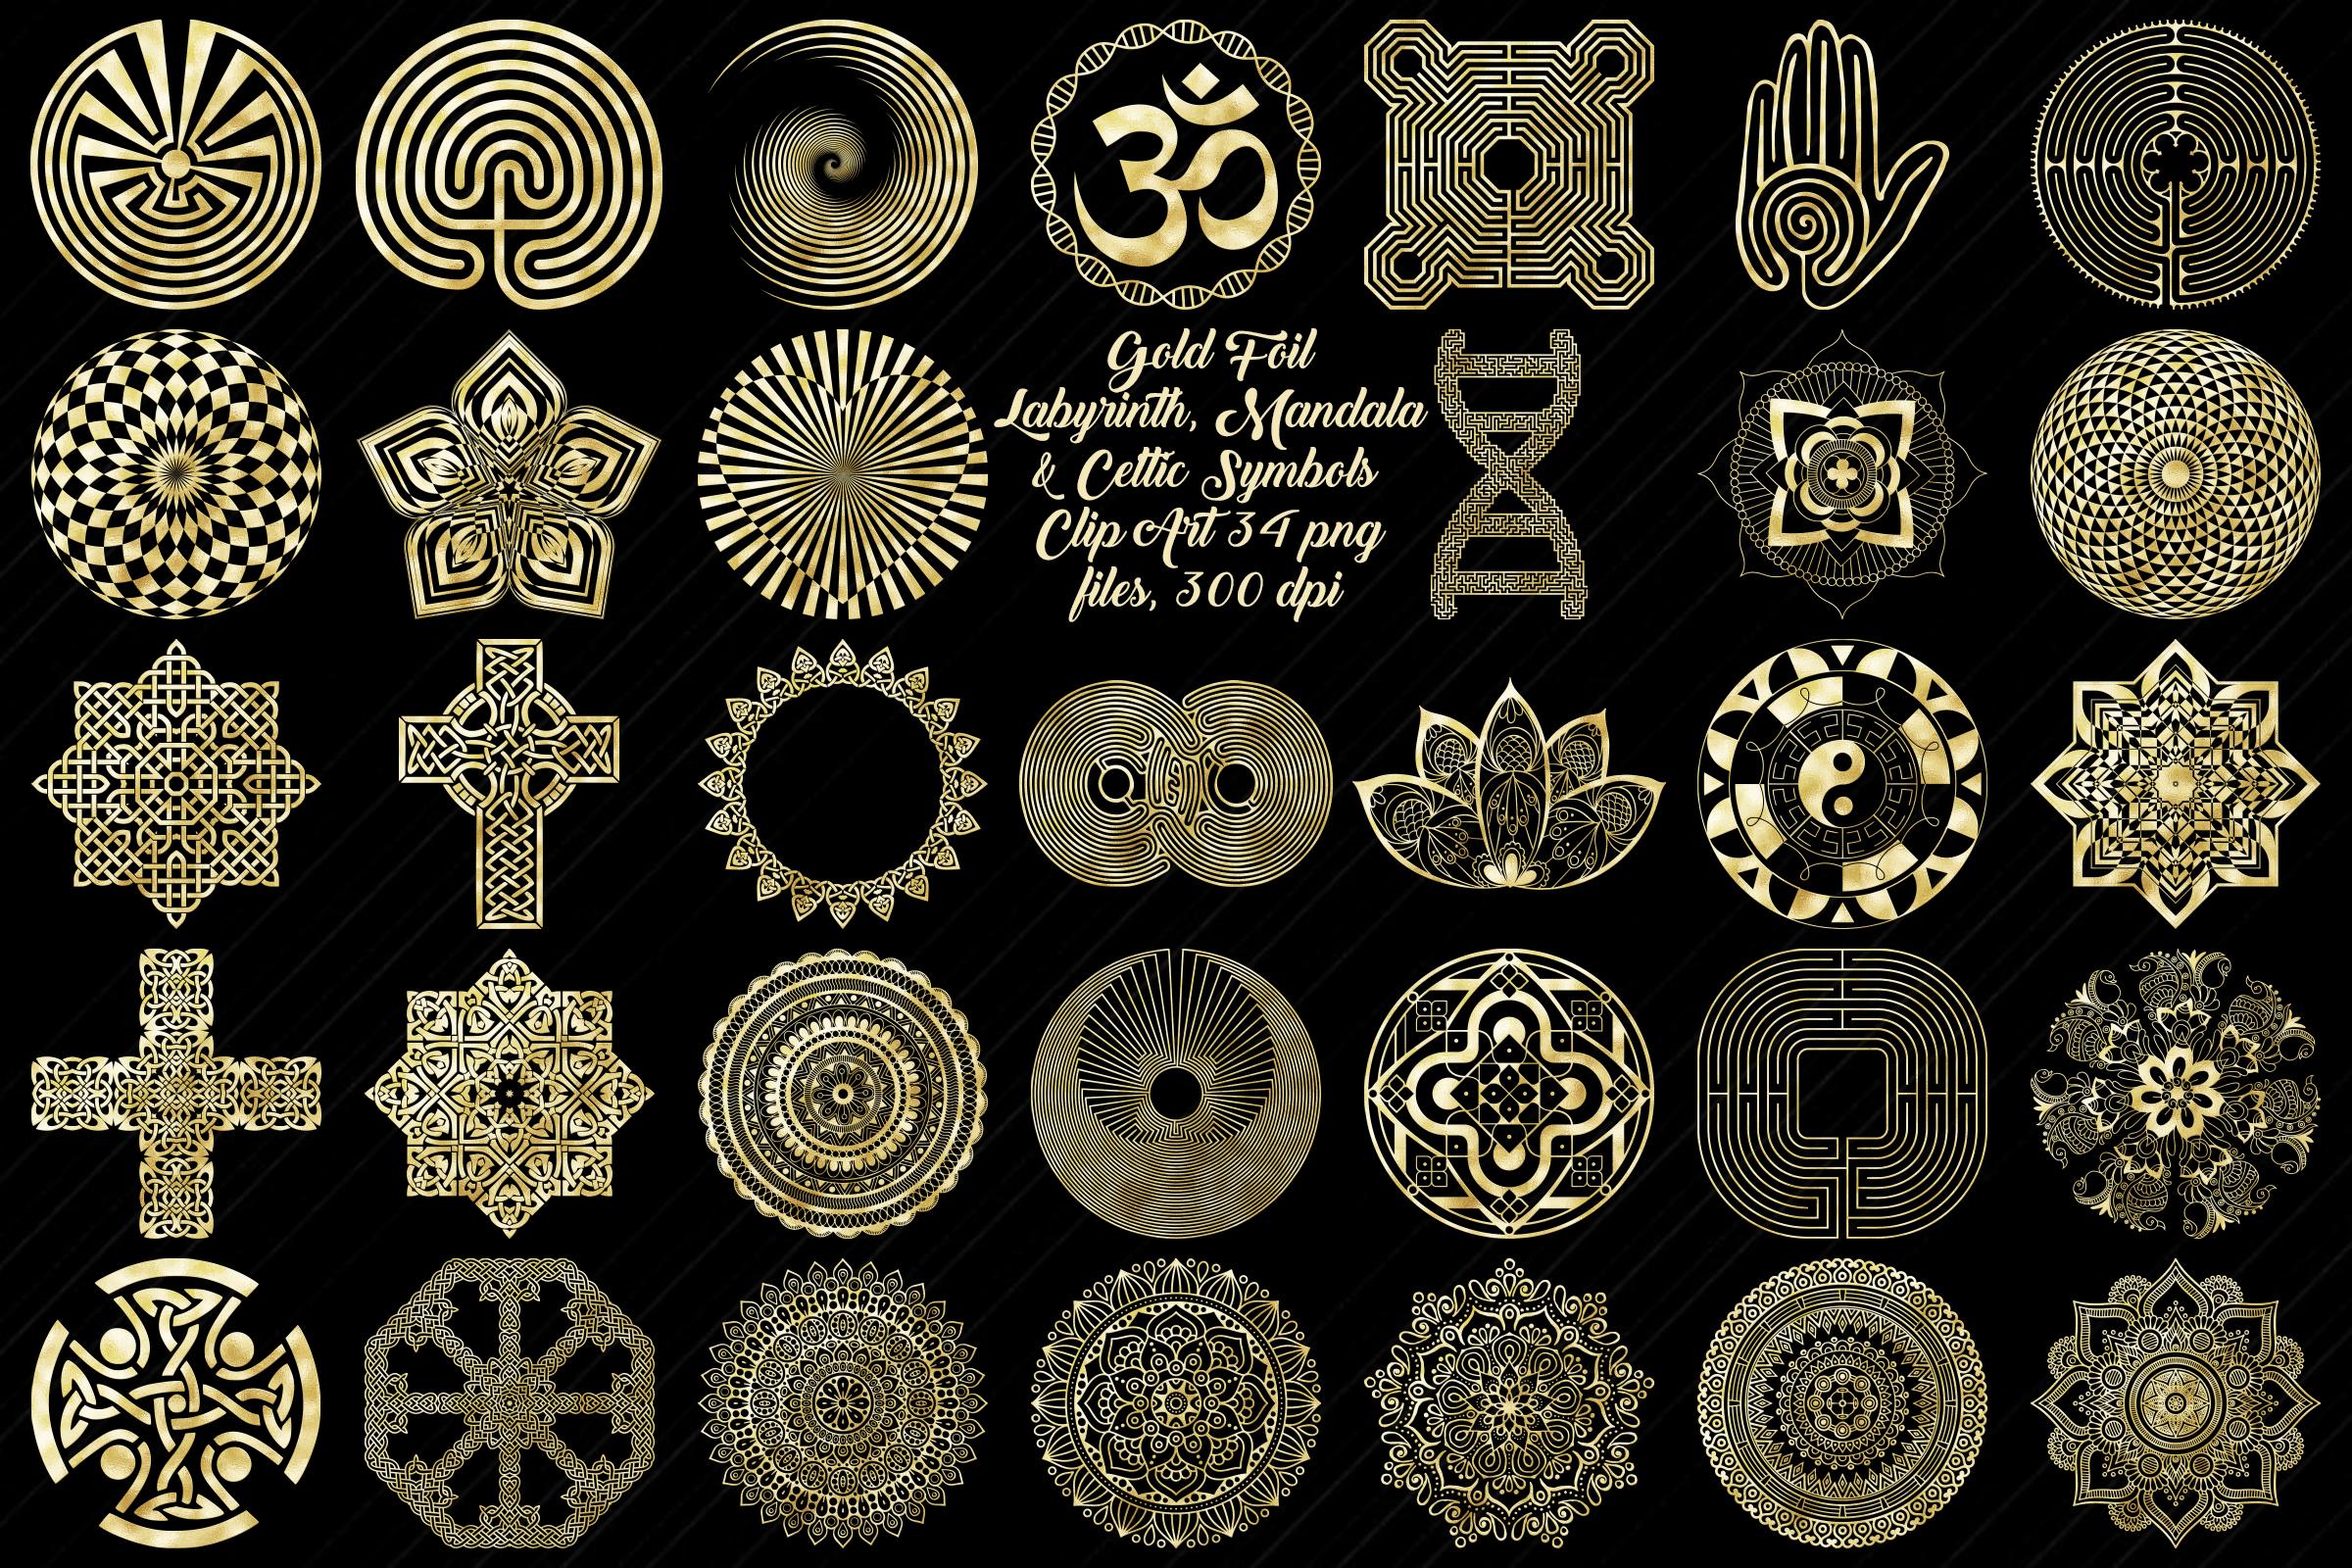 Gold Foil Labyrinth, Mandalas & Celtic Symbols Clip Art example image 1